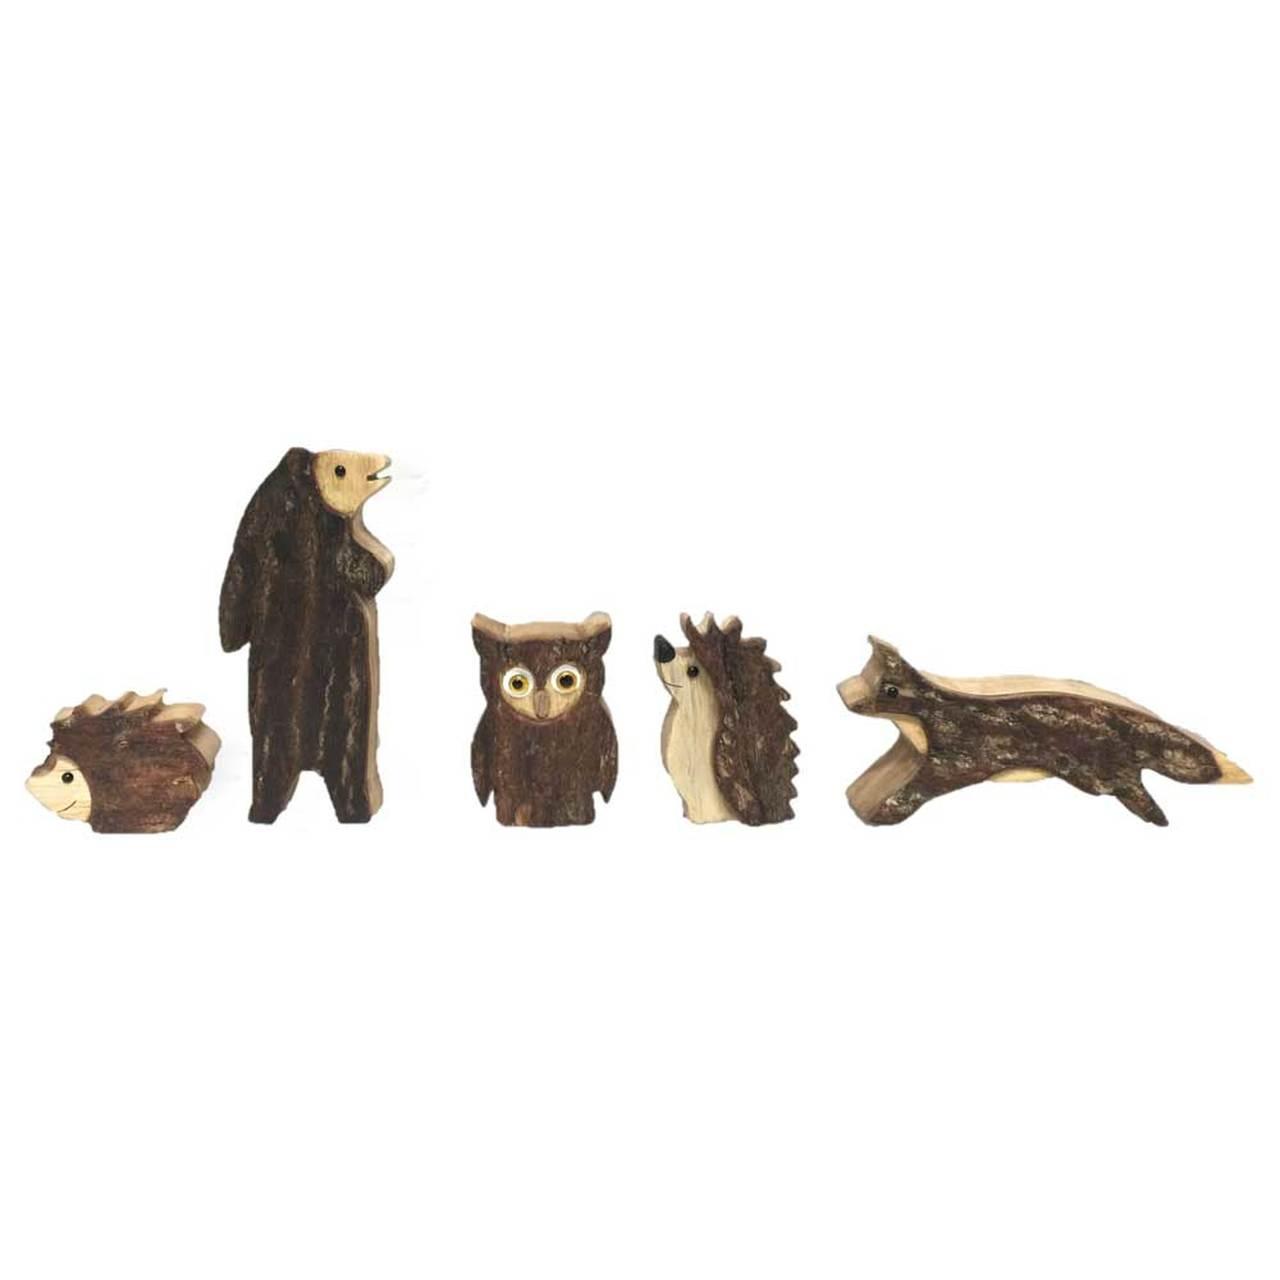 Img Galeria Set de animales de madera Papoose